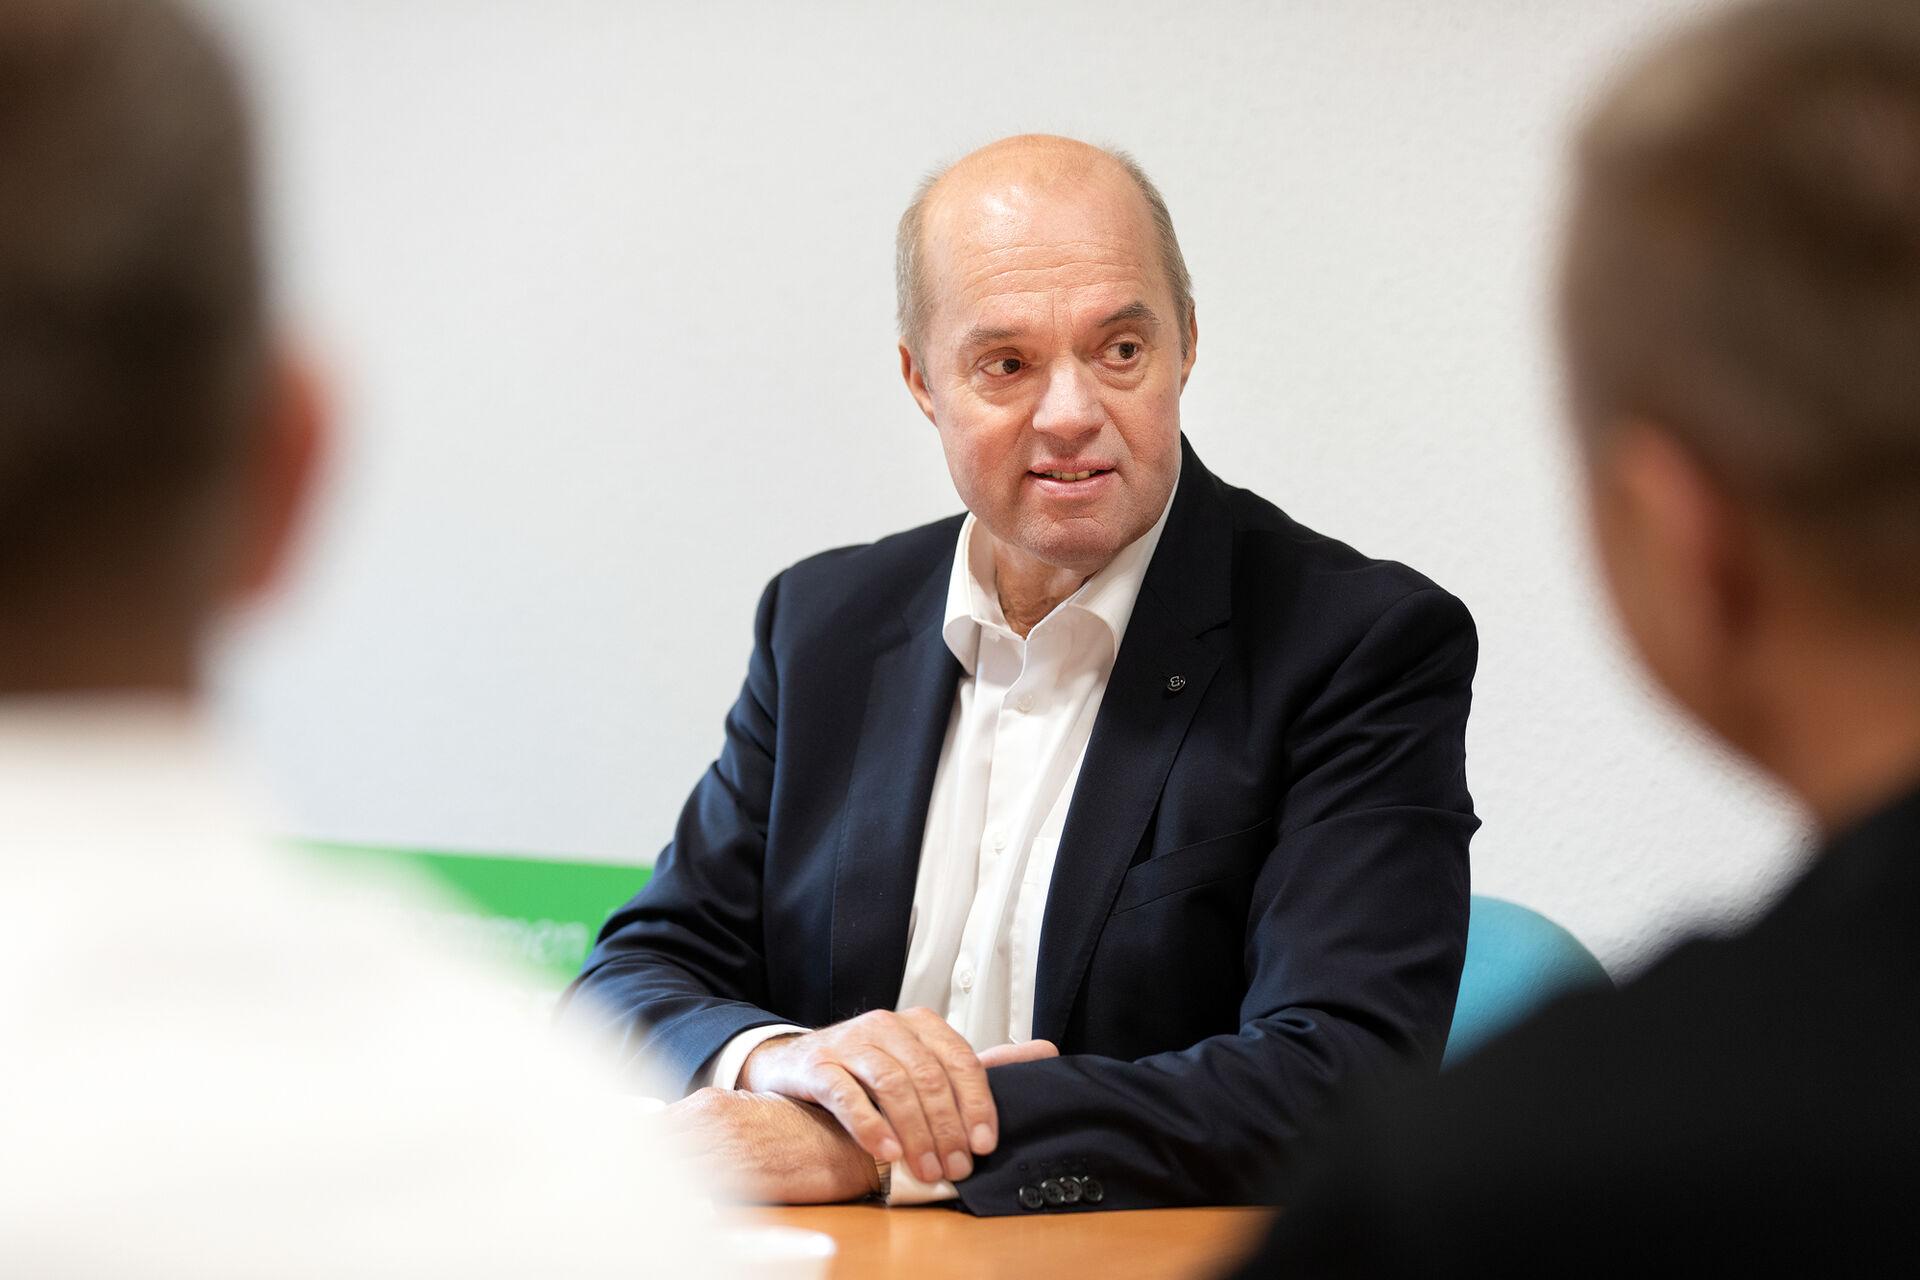 Dieter Perko